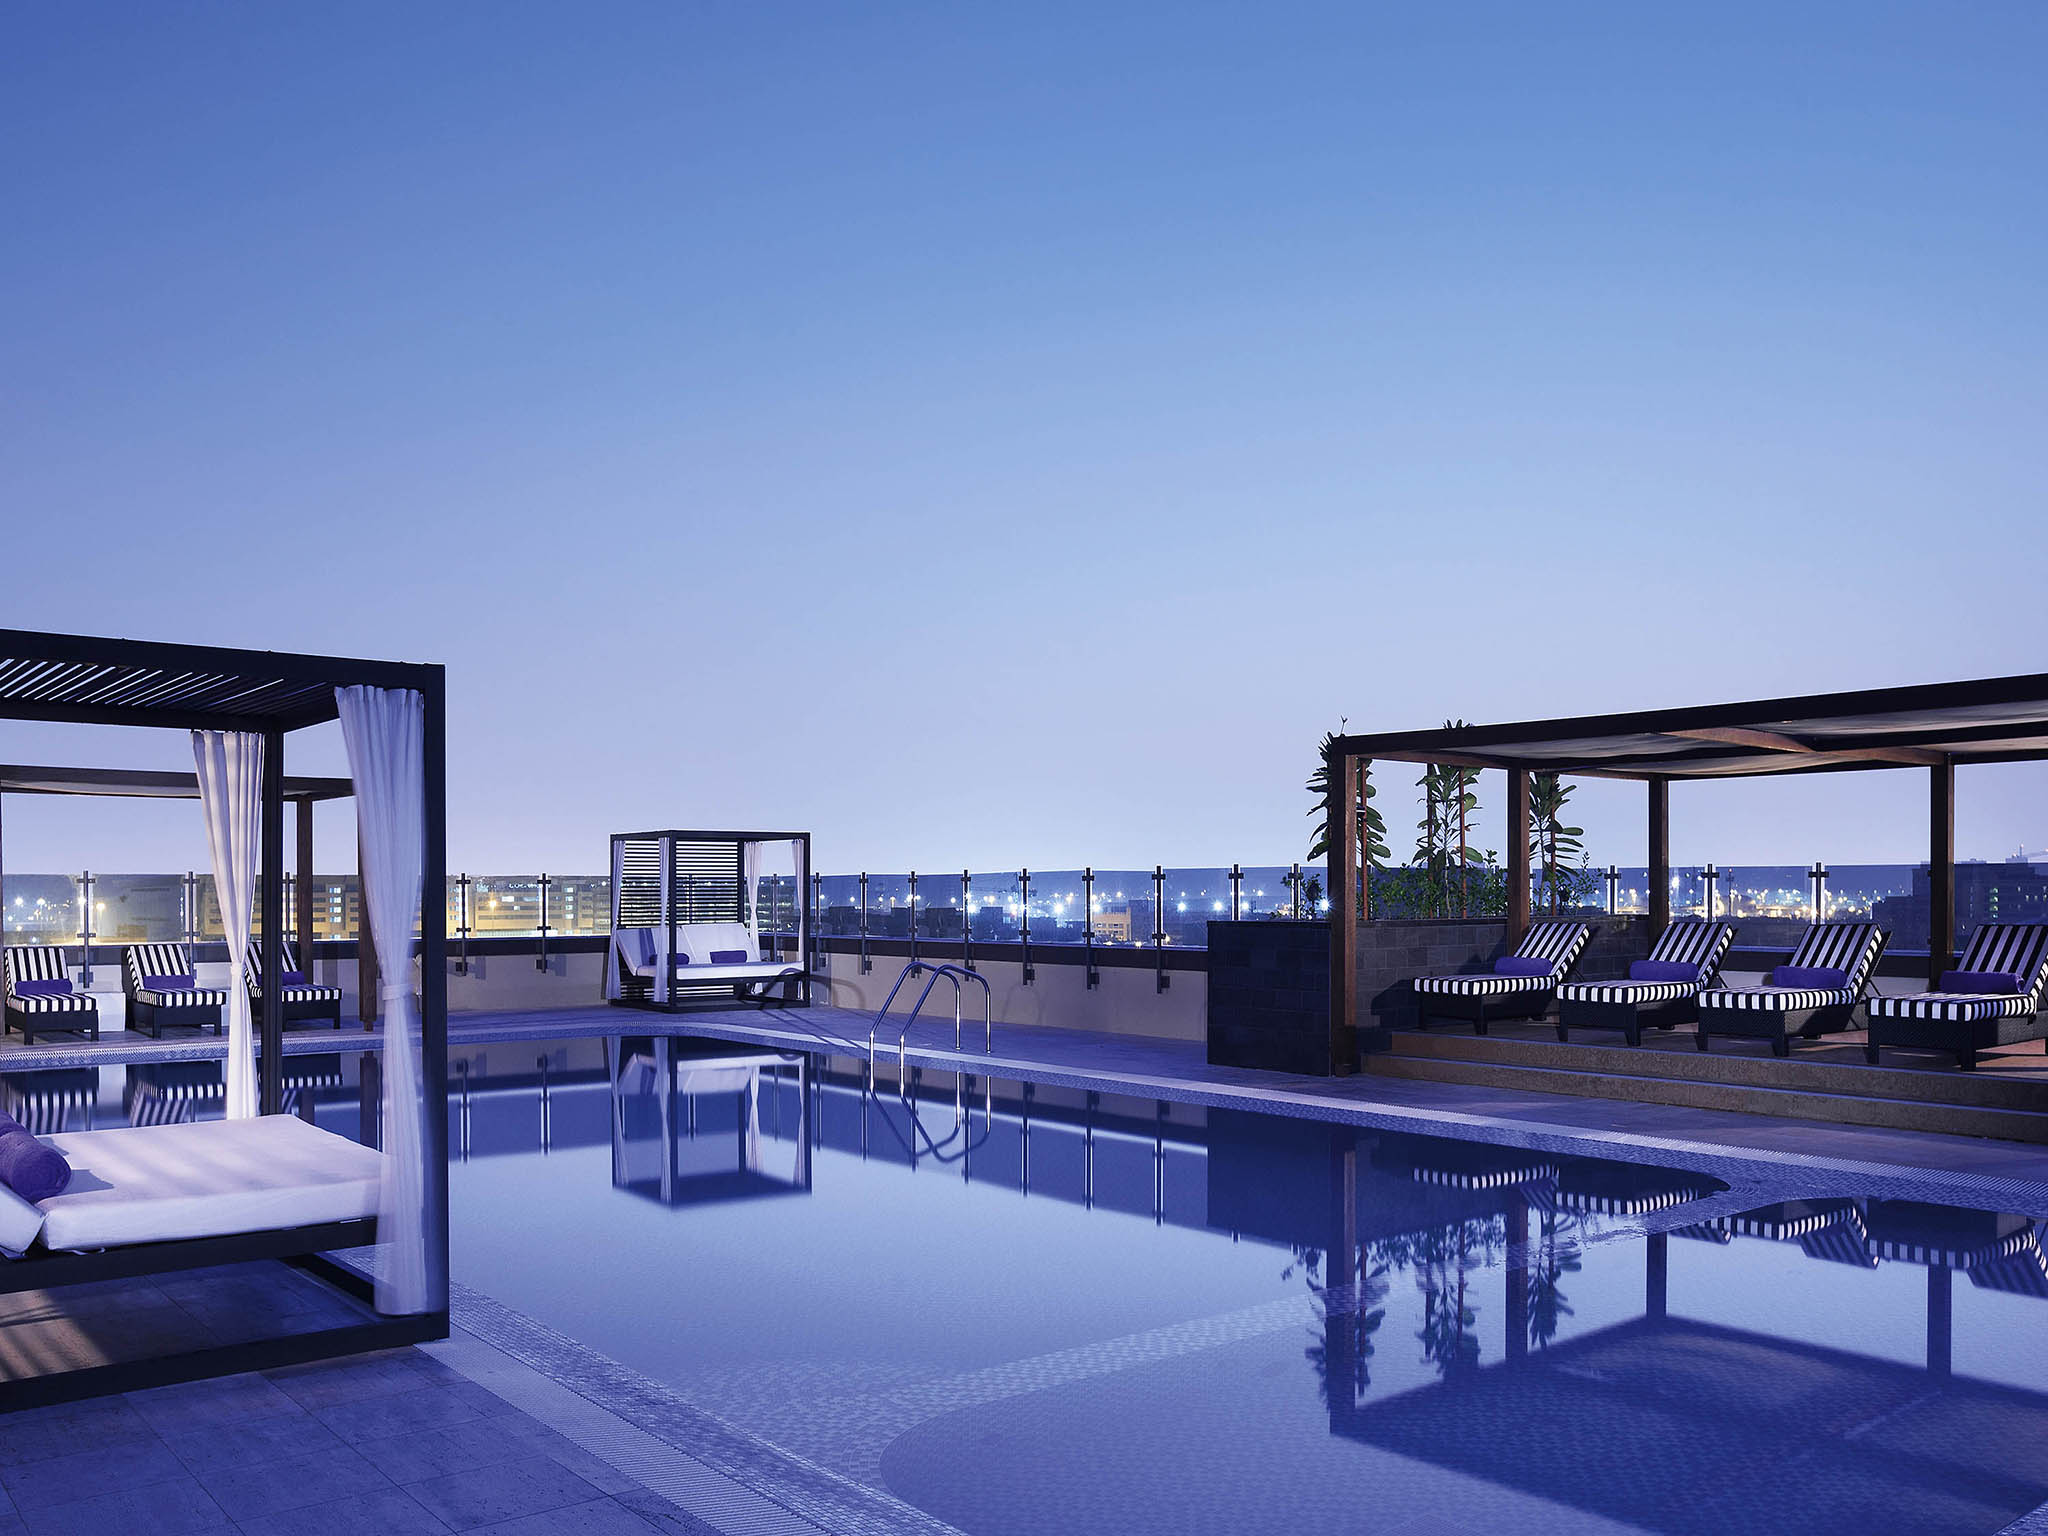 فندق - فندق بولمان Pullman دبي كريك سيتي سنتر